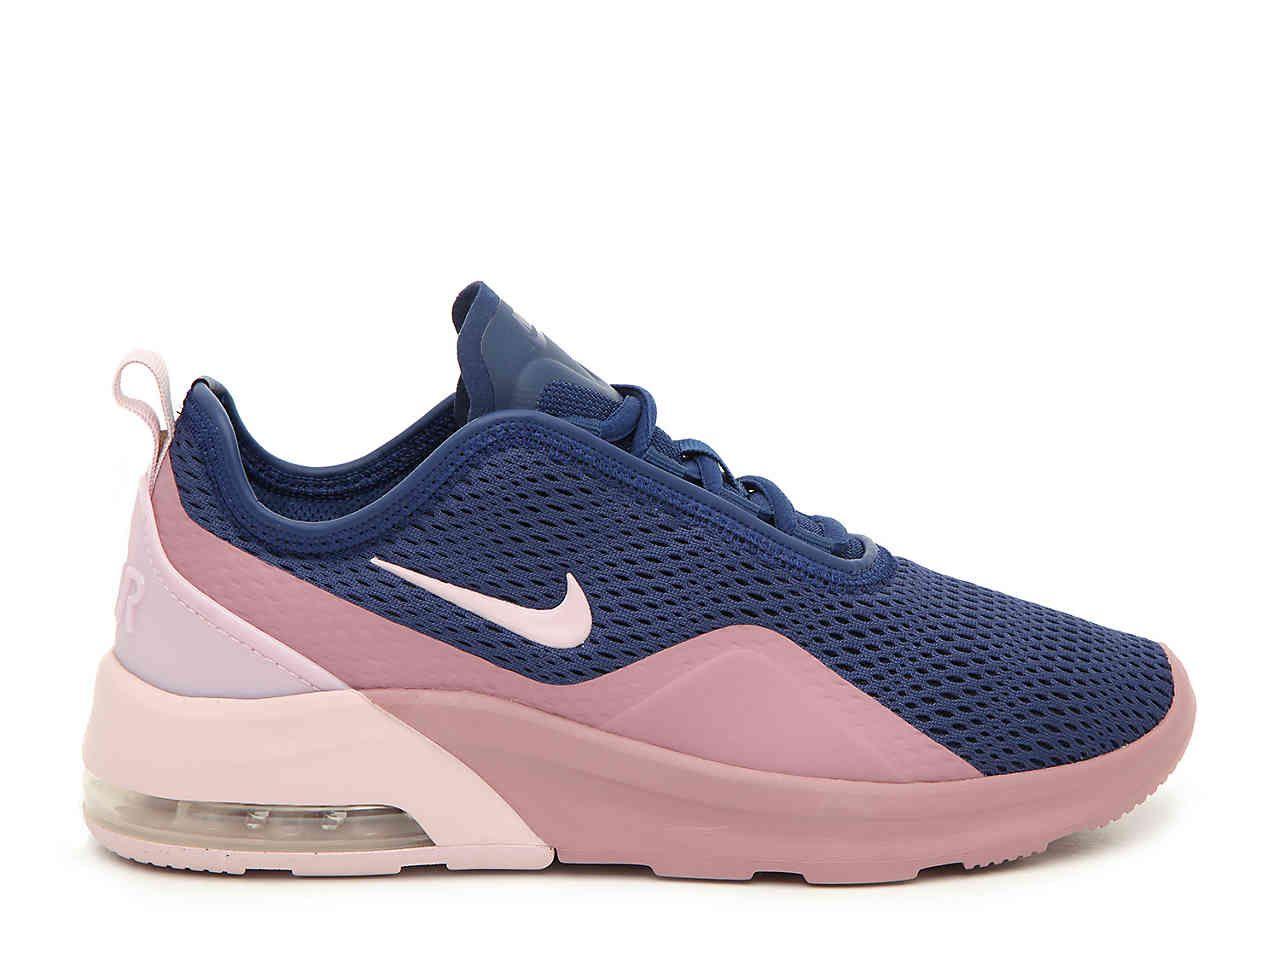 Nike Air Max Motion 2 Sneaker - Women's